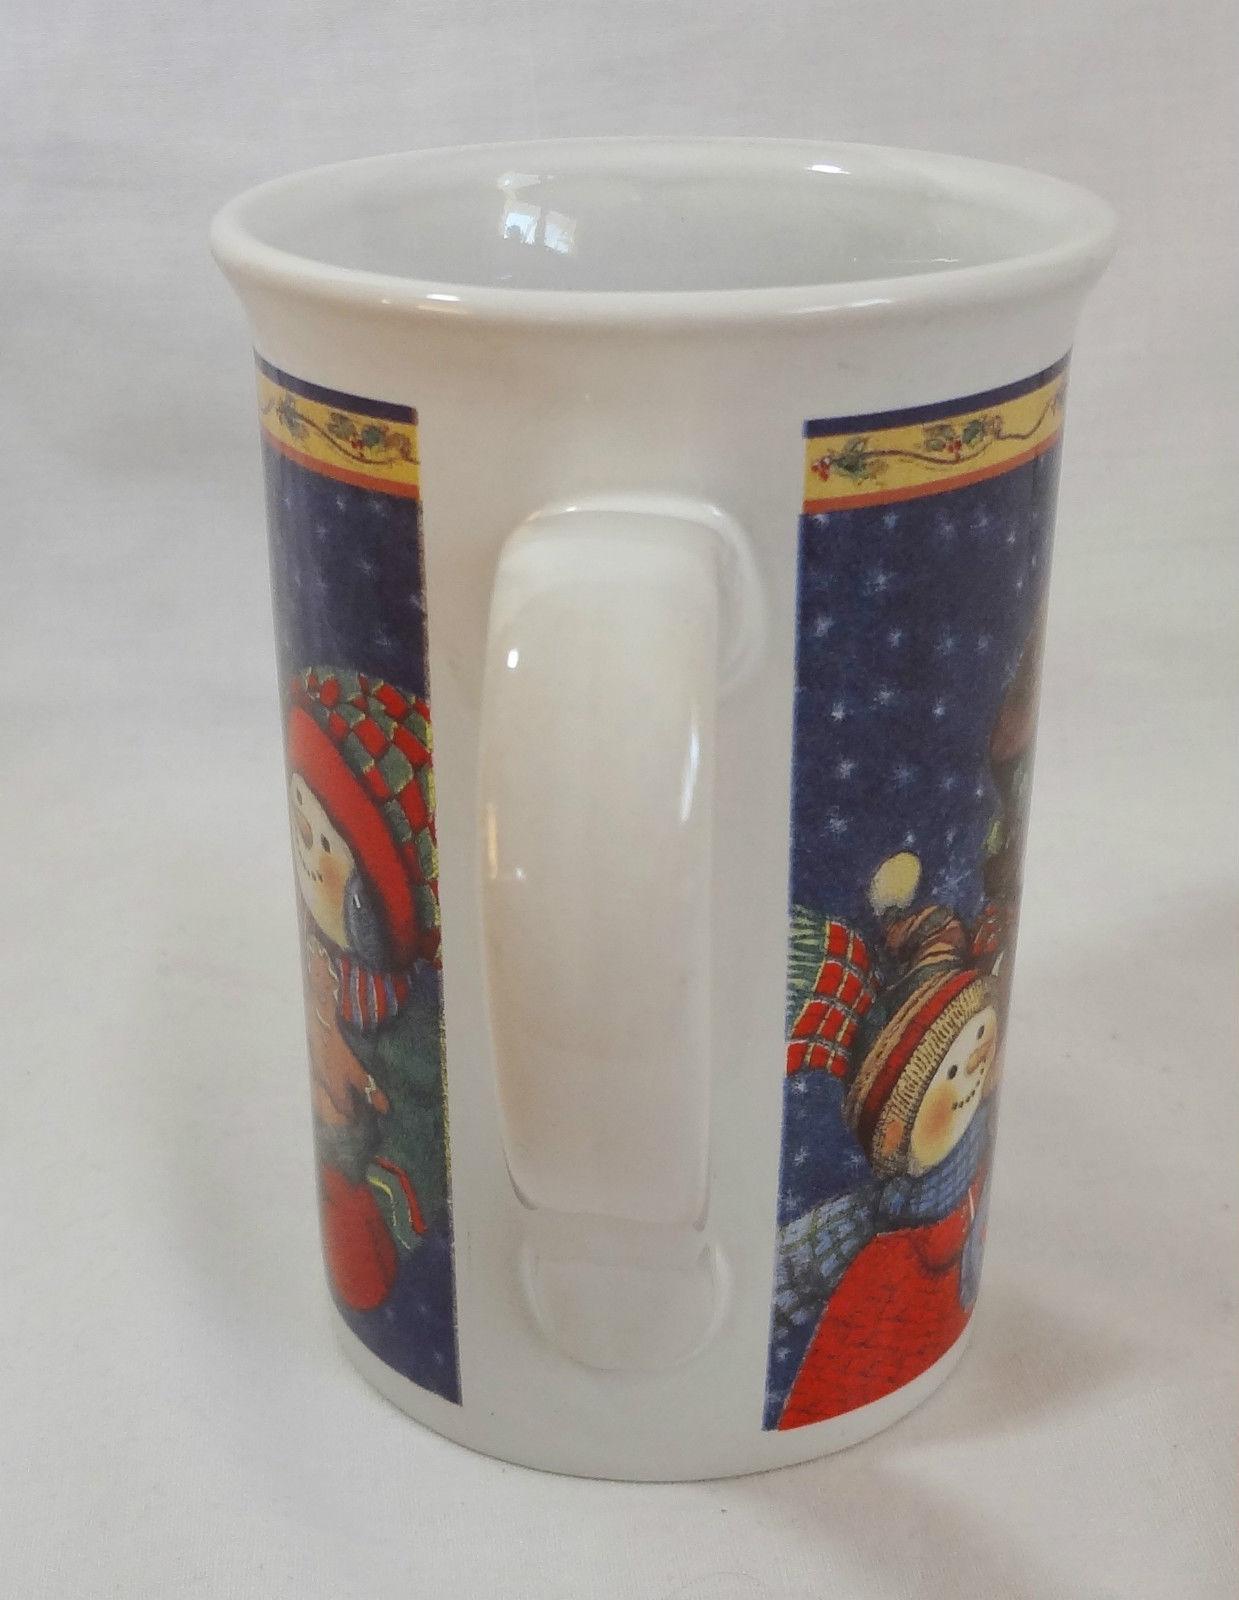 Christmas Snowman Family Gingerbread Cookies 10 oz Coffee Mug Cup